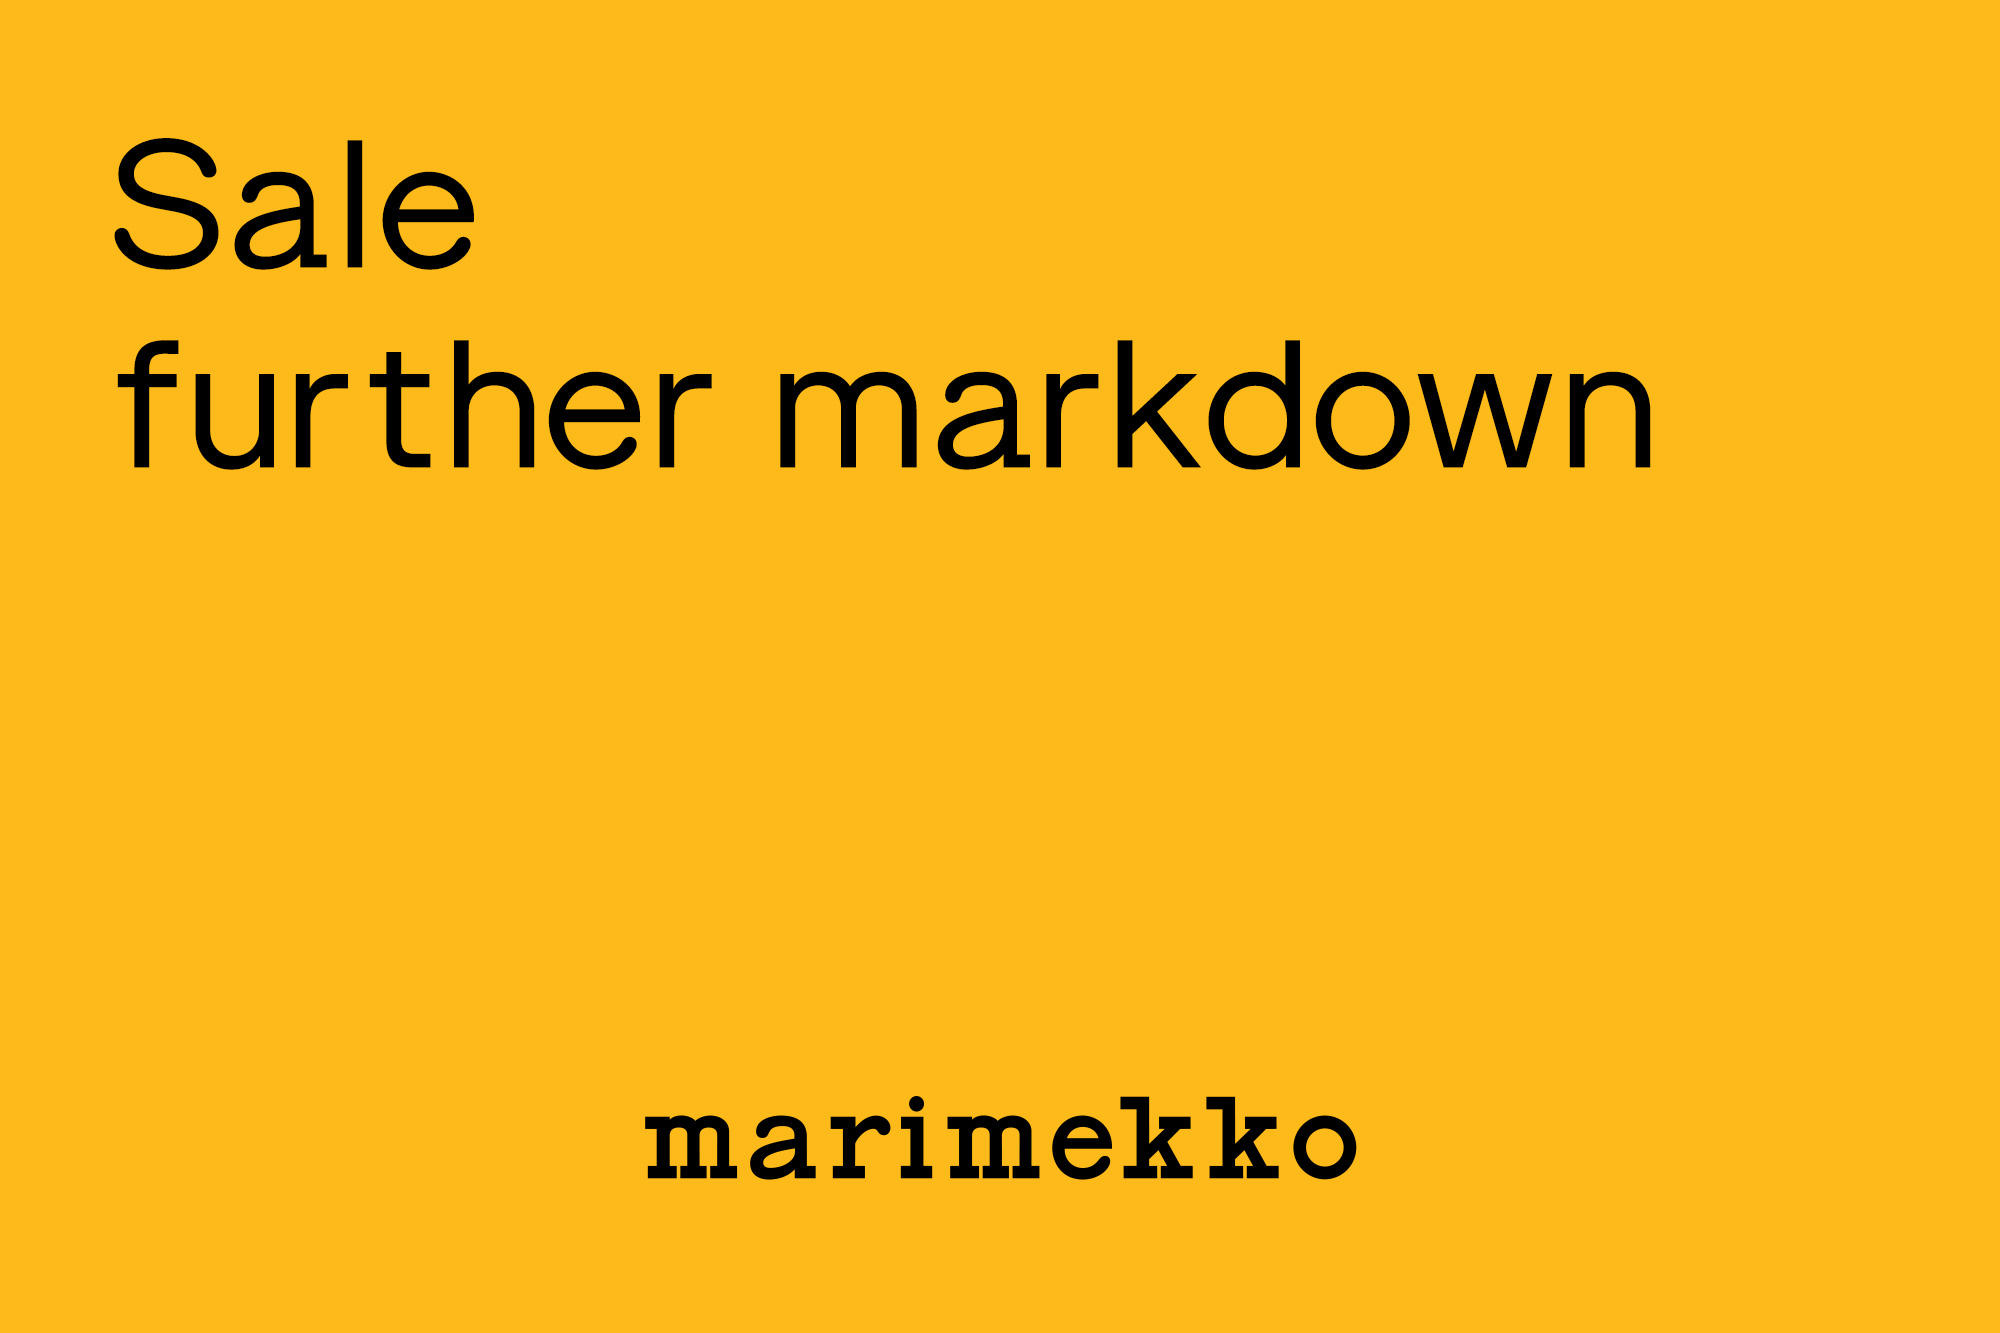 7.21- Sale further markdown